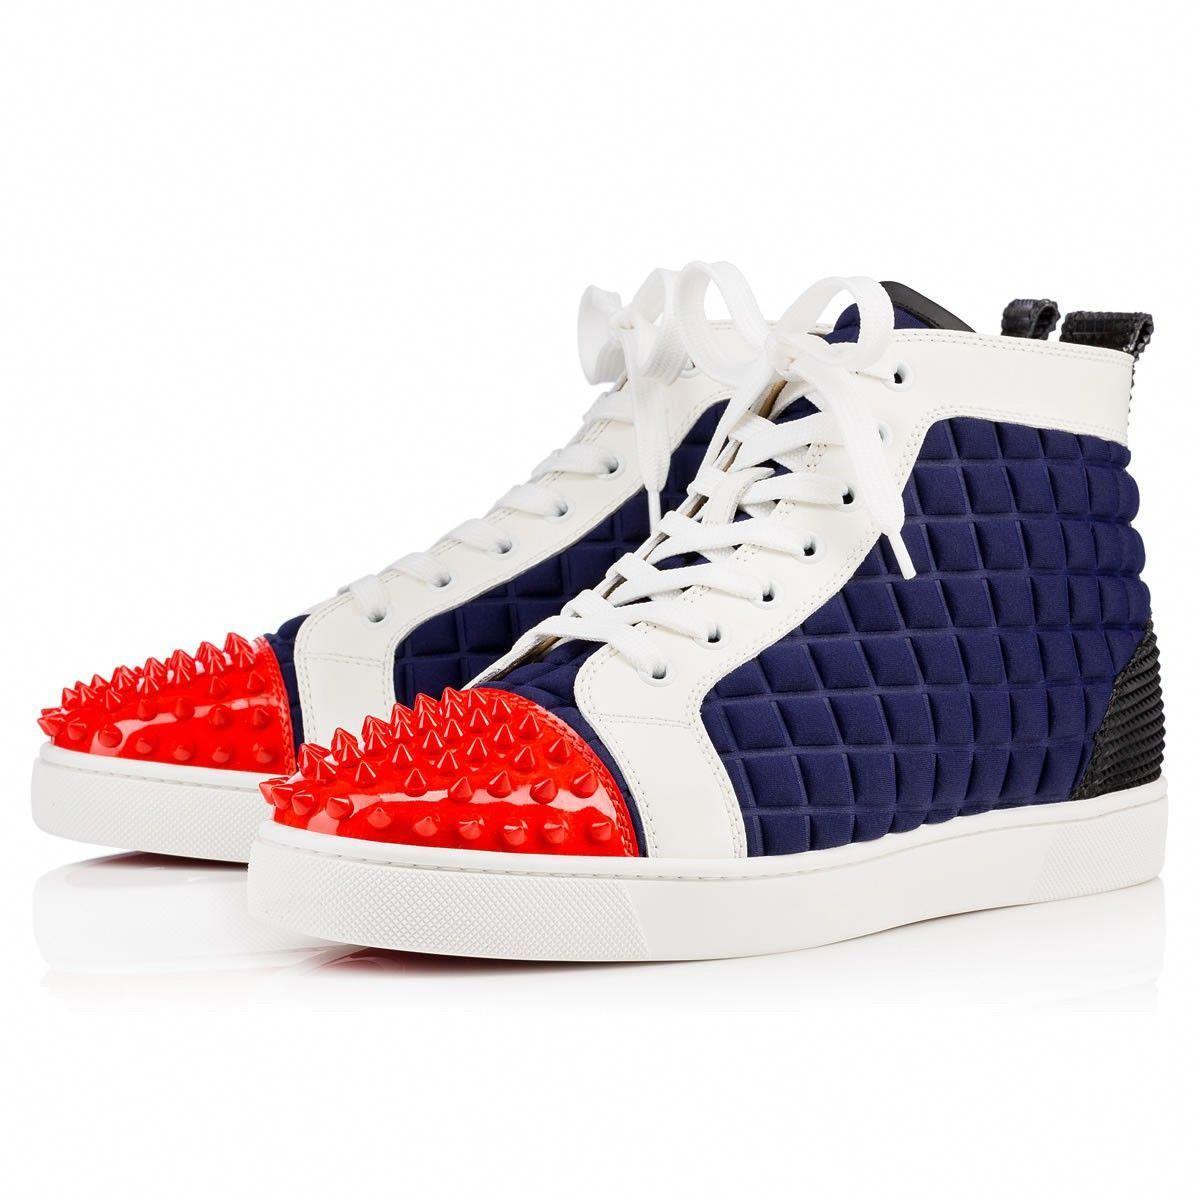 ee6fdf70805e CHRISTIAN LOUBOUTIN Lou Spikes Men S Flat Version Multi Neoprene.   christianlouboutin  shoes